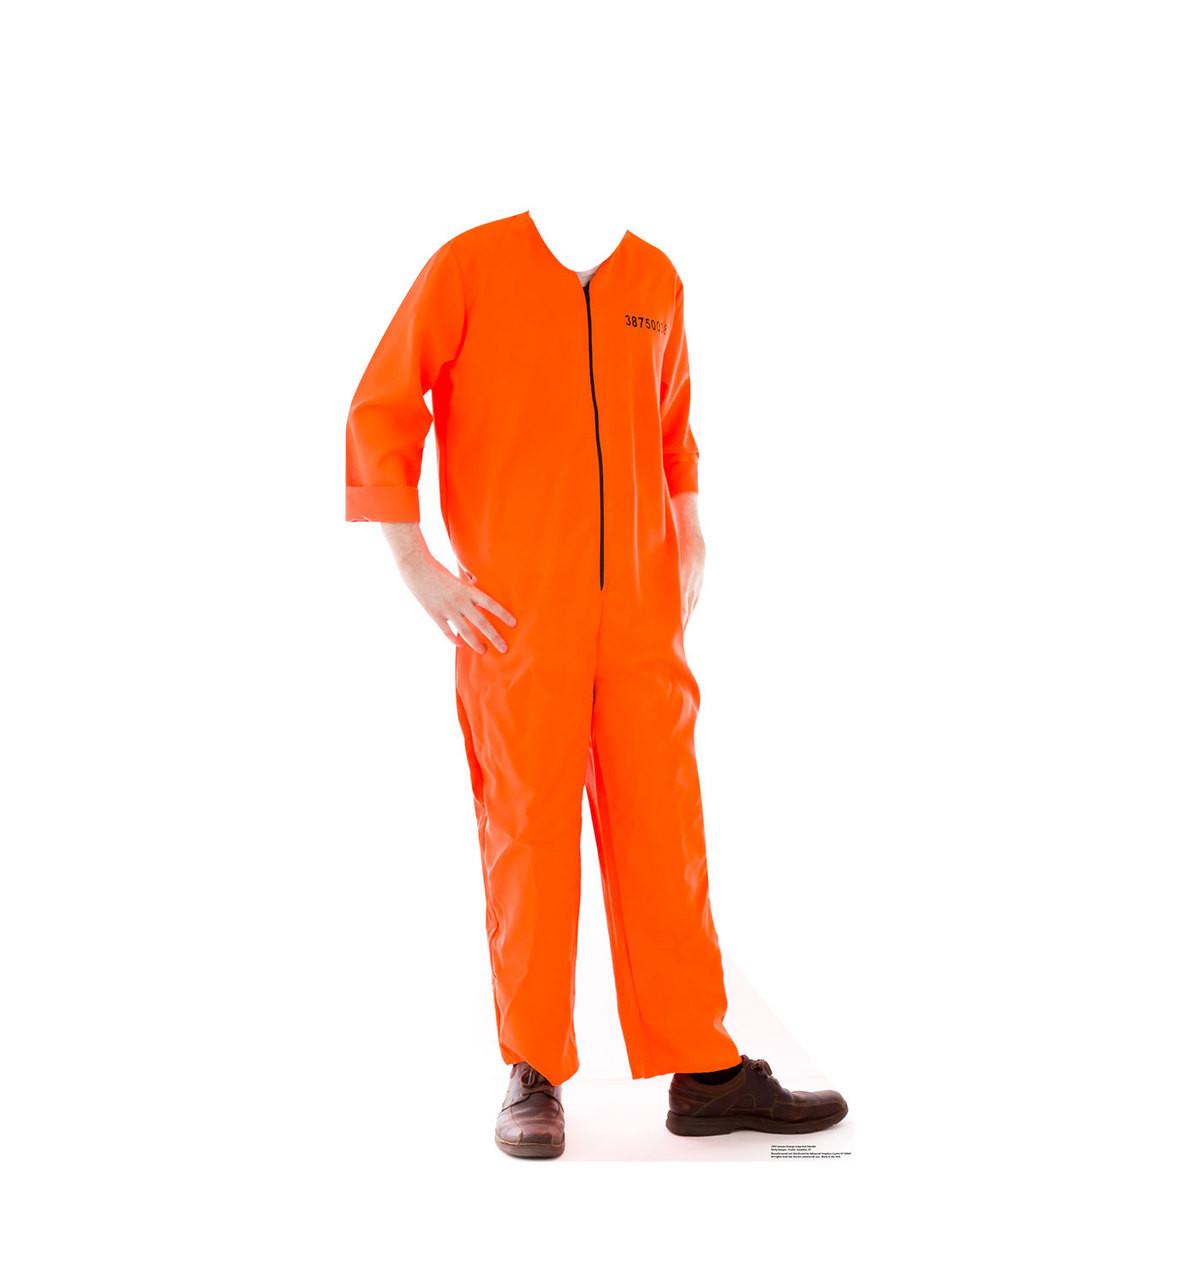 Life-size Inmate Orange Jump Suit Stand-in Cardboard Standup | Cardboard Cutout 3